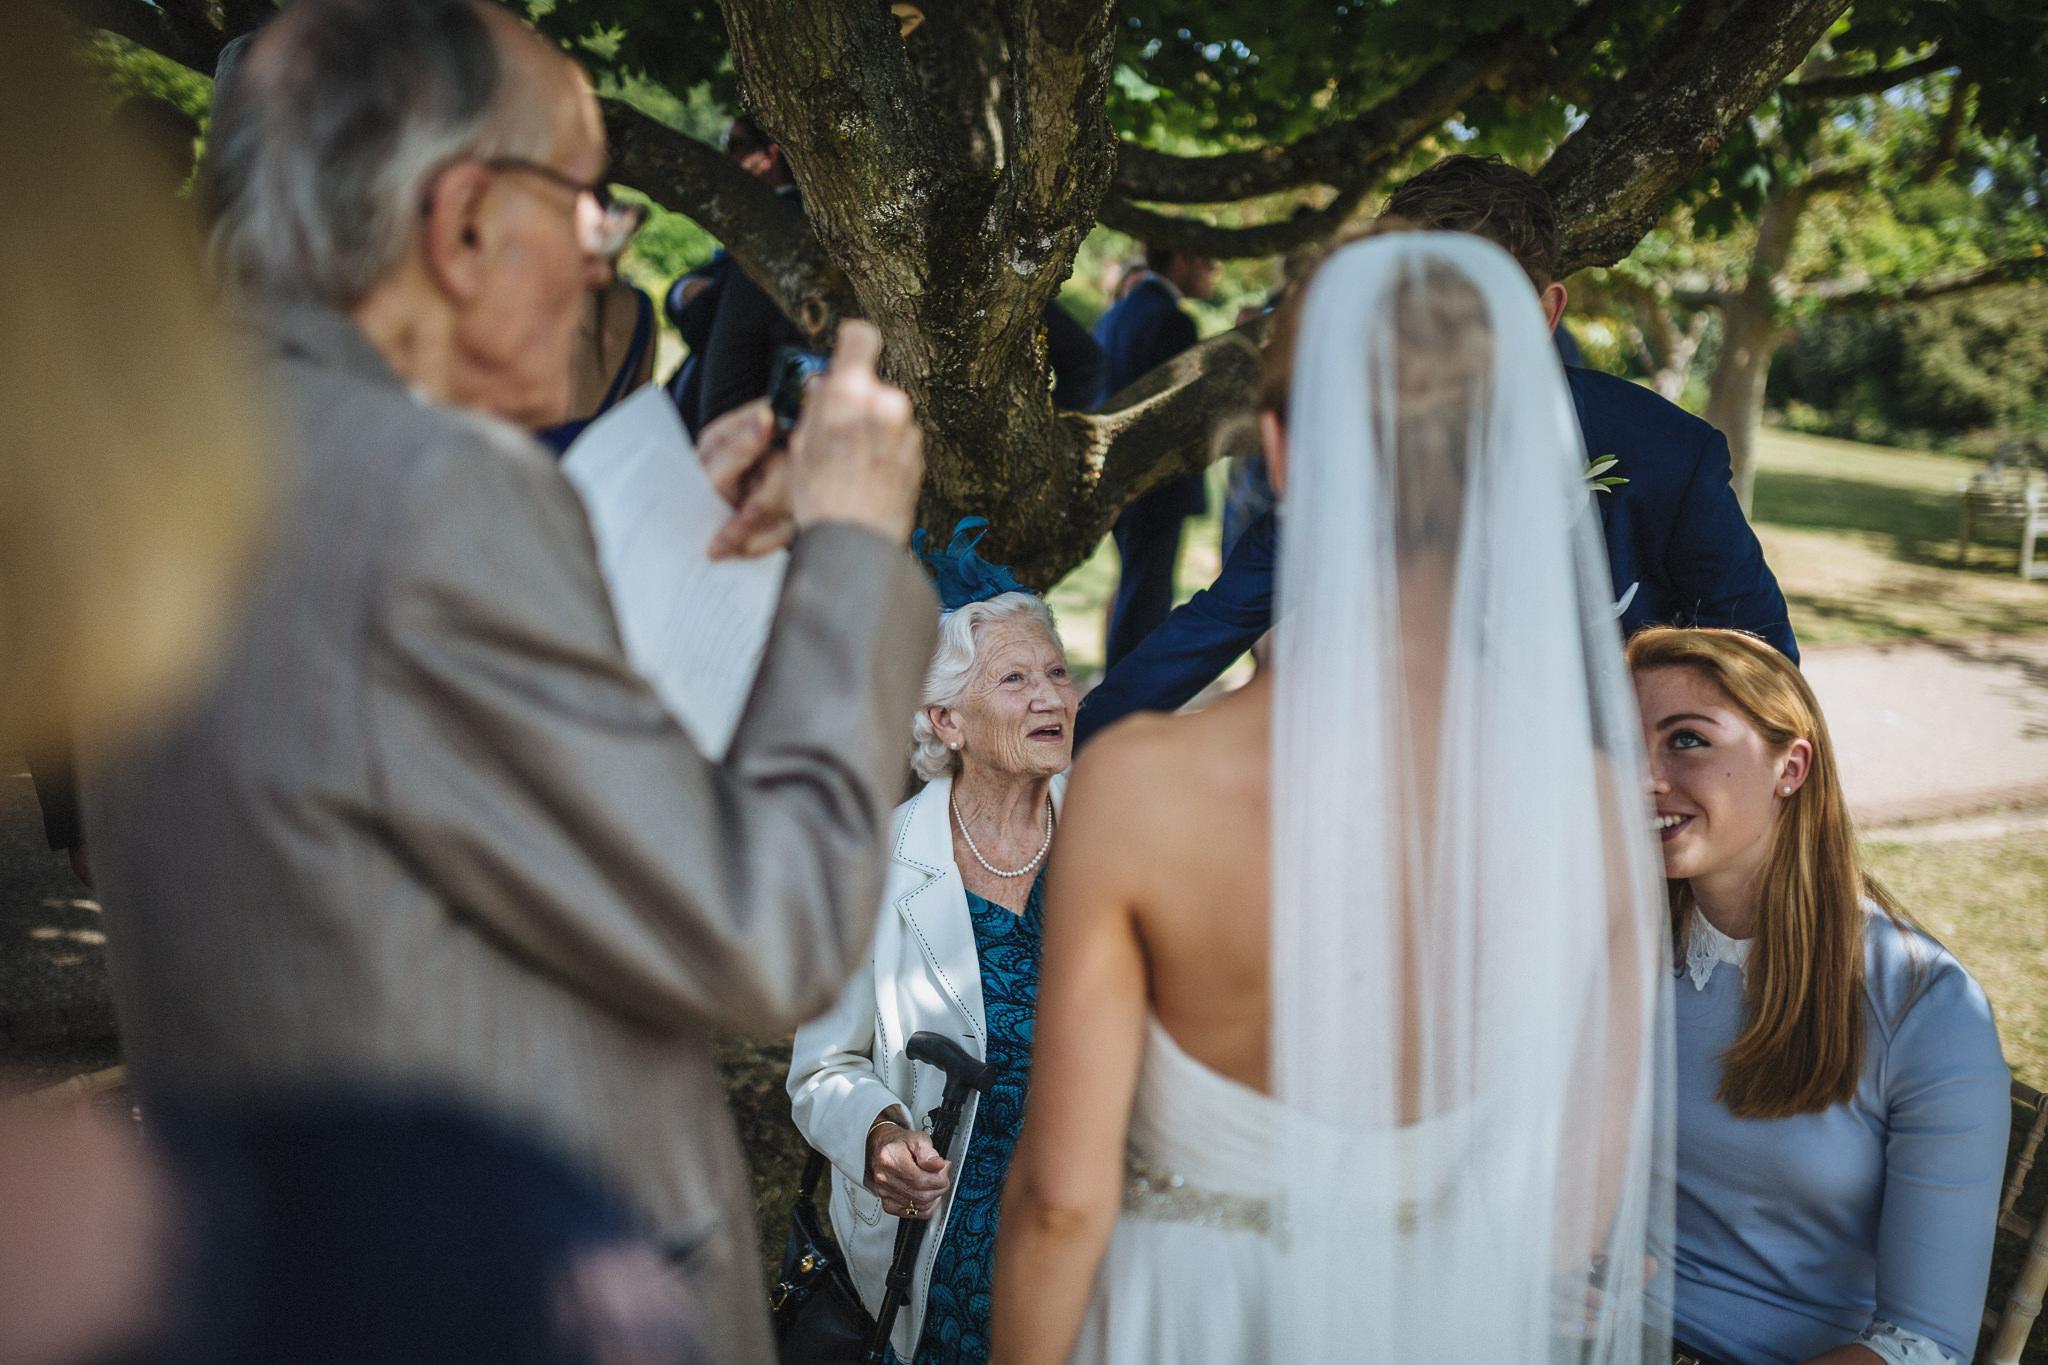 paul-marbrook-Gaynes-Park Wedding-Photographer-90073